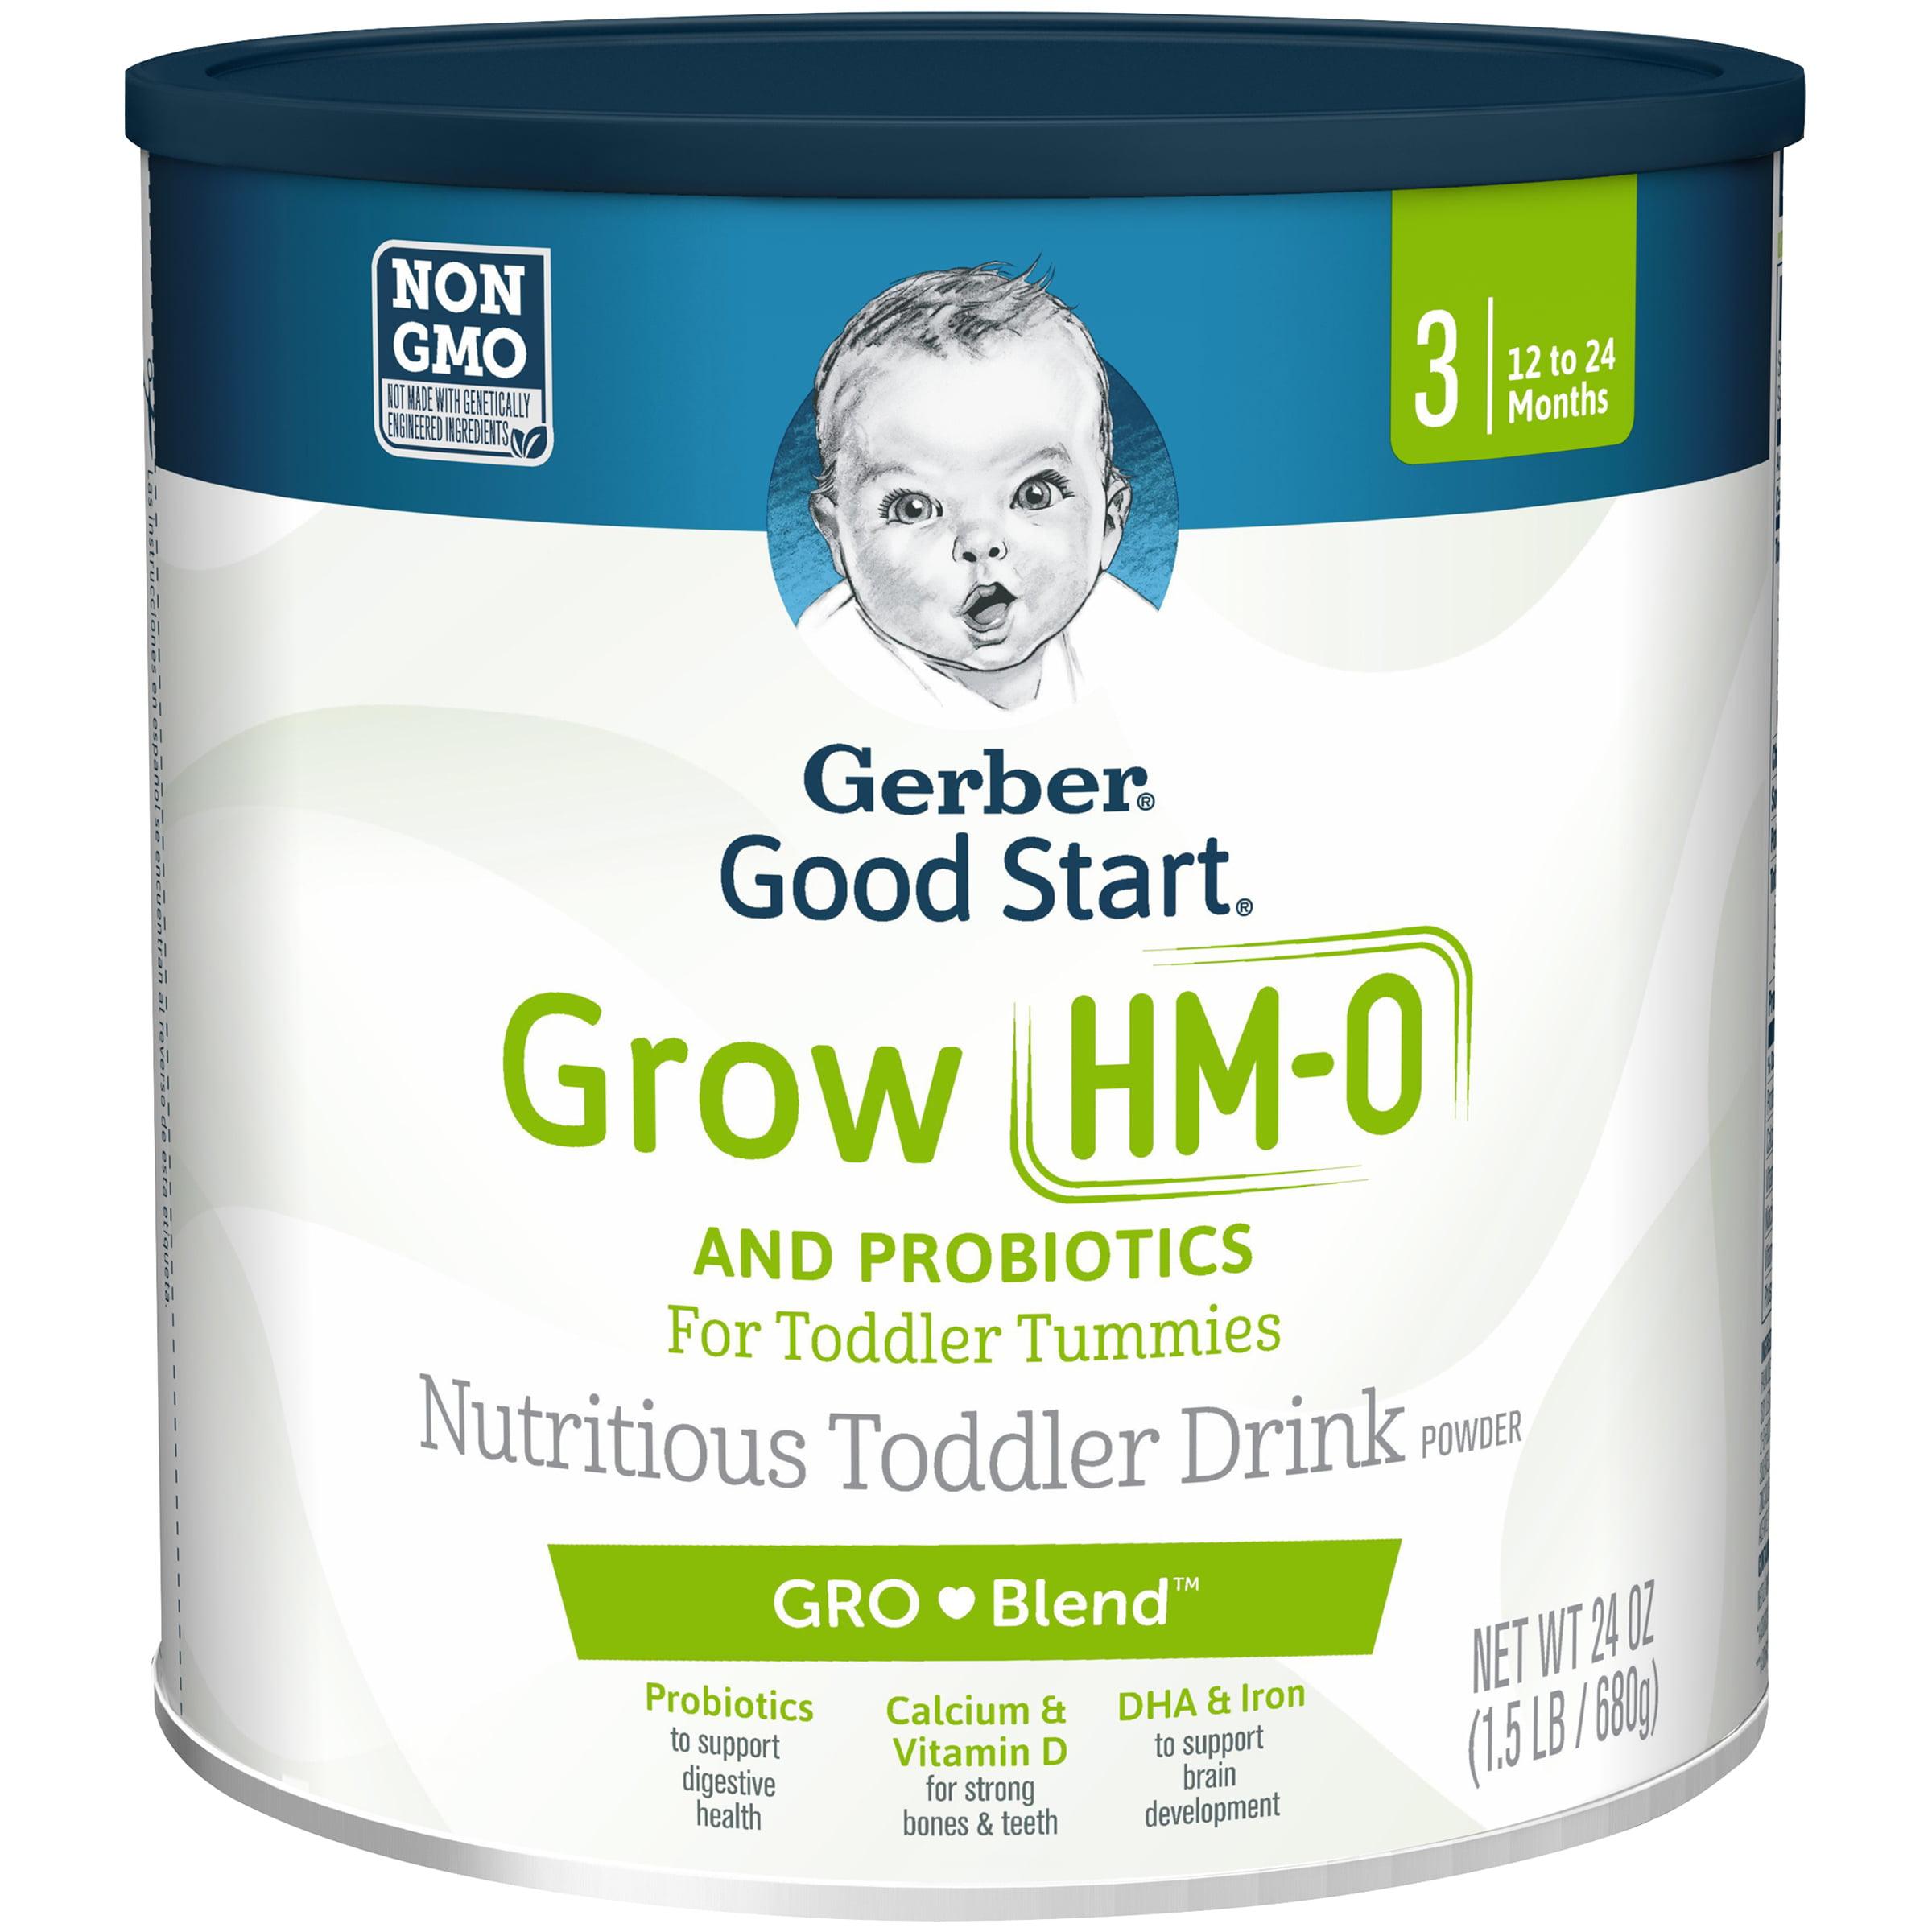 Gerber Good Start Grow Non-GMO Powder Nutritious Toddler Drink, Stage 3, 24 oz